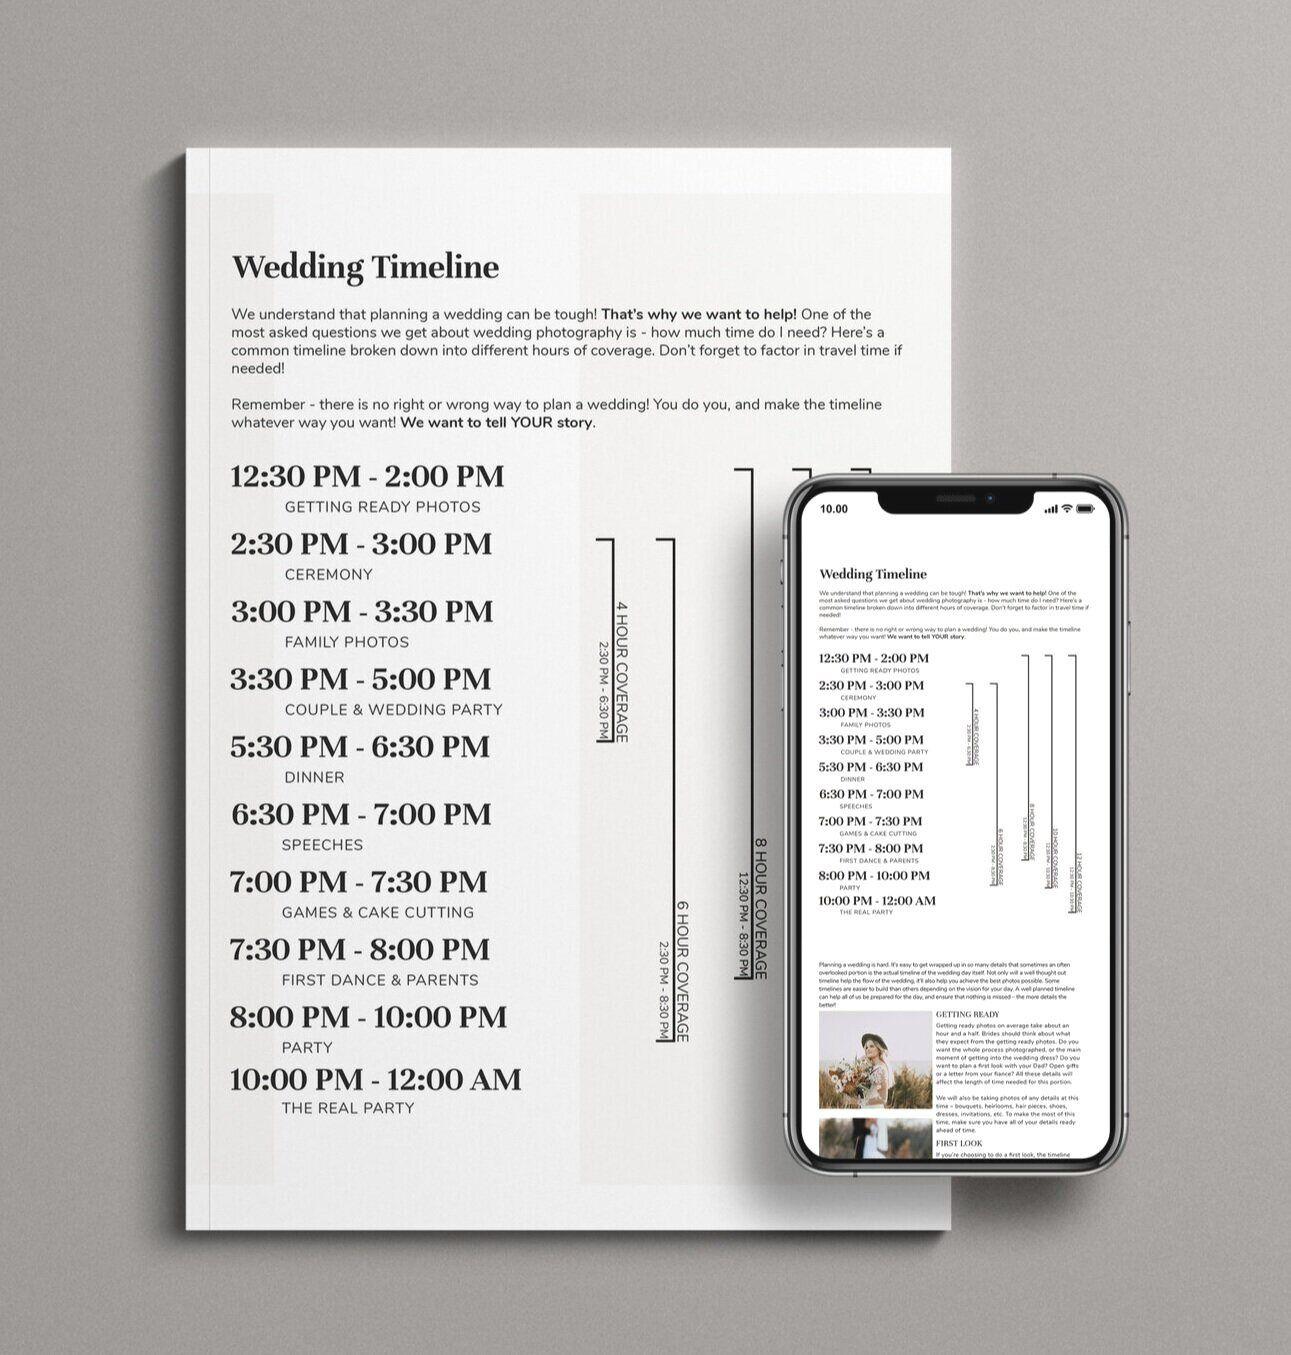 006 Singular Wedding Timeline Template Free Image  Day Excel ProgramFull